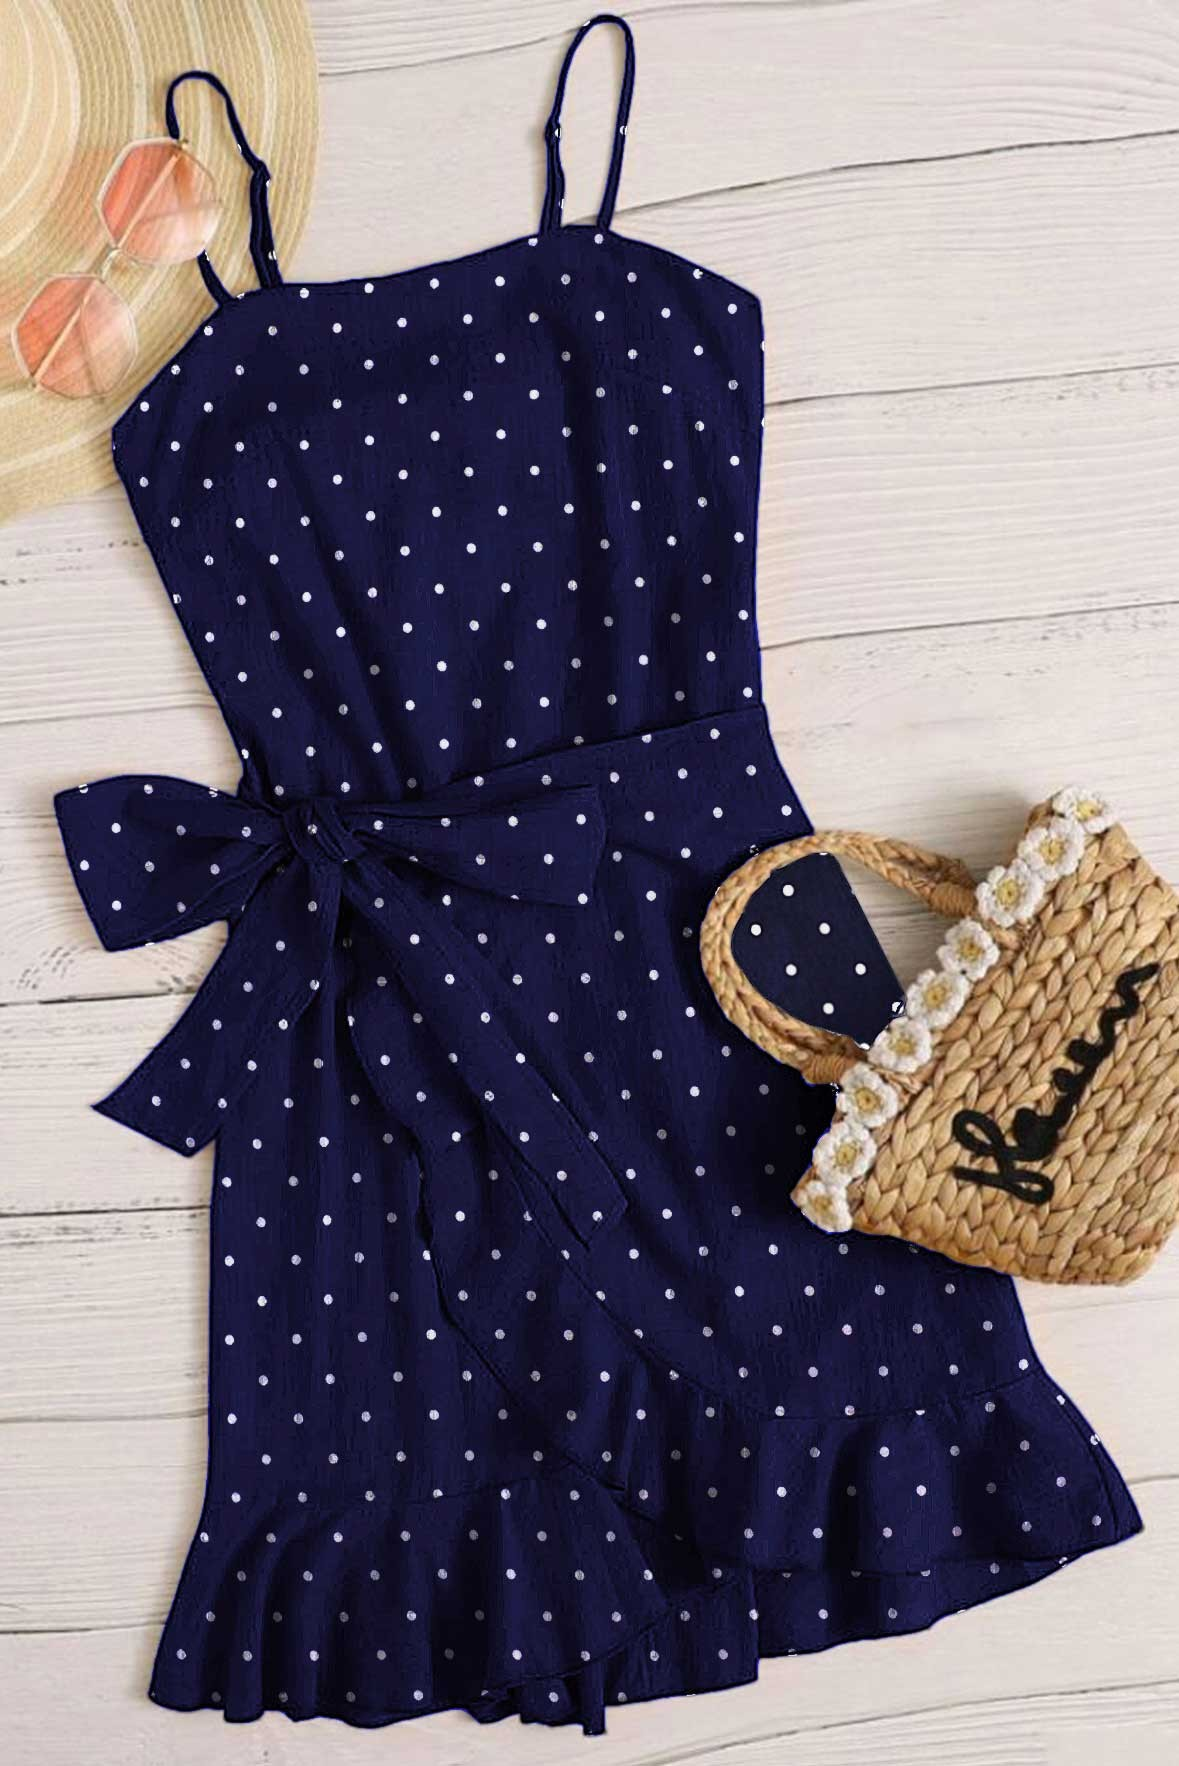 Gilmore girls blue polka dot wrap dress